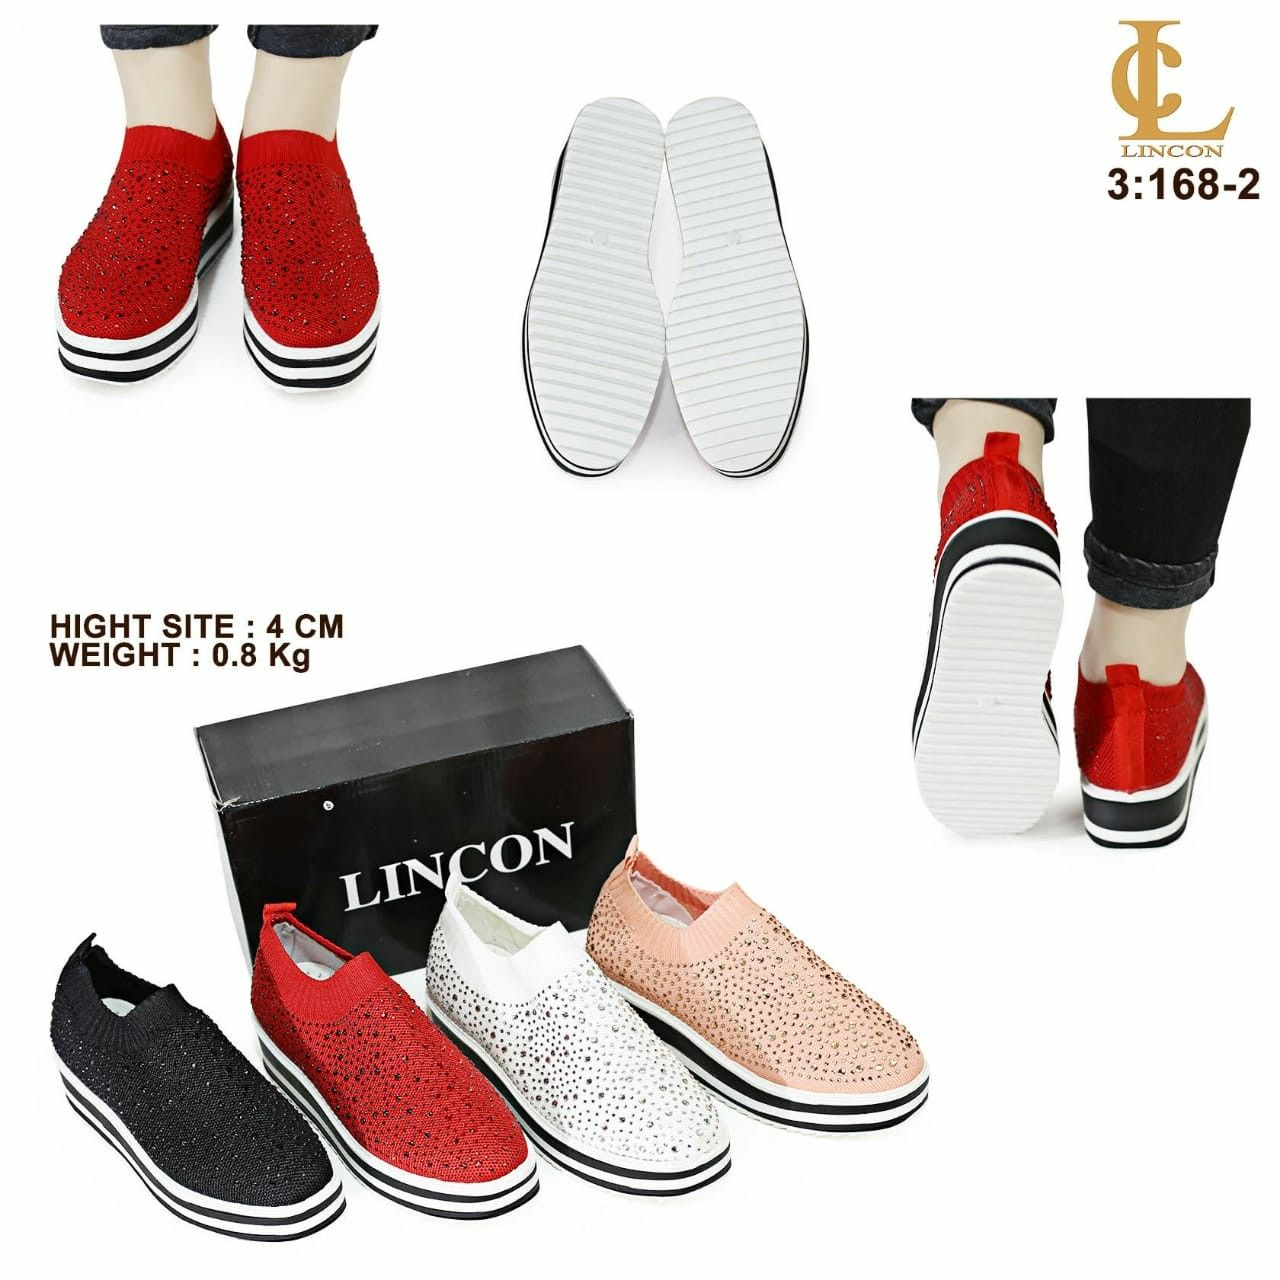 Sepatu Merek Lincon Diamond Seri 168 2 Kualitas Original Brand